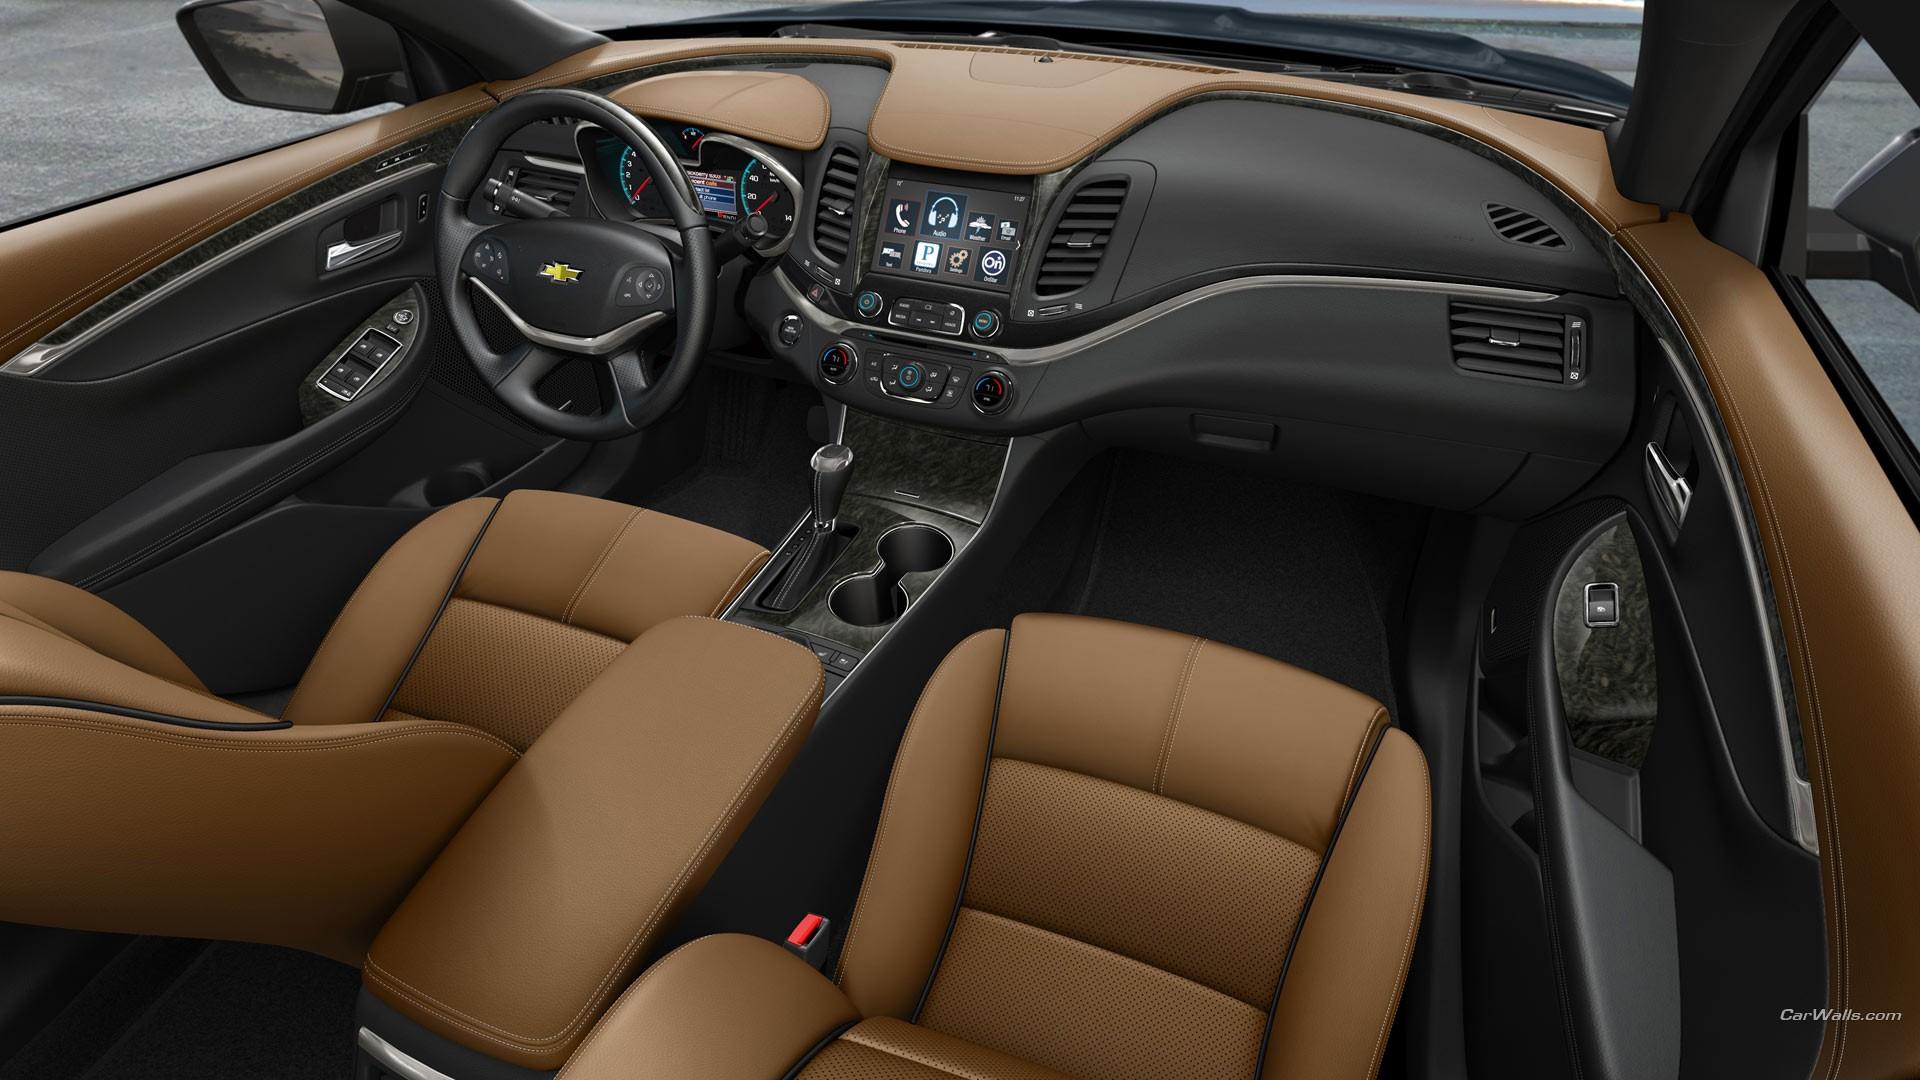 Hintergrundbilder : Fahrzeug, Auto Innenraum, Chevrolet Impala ...